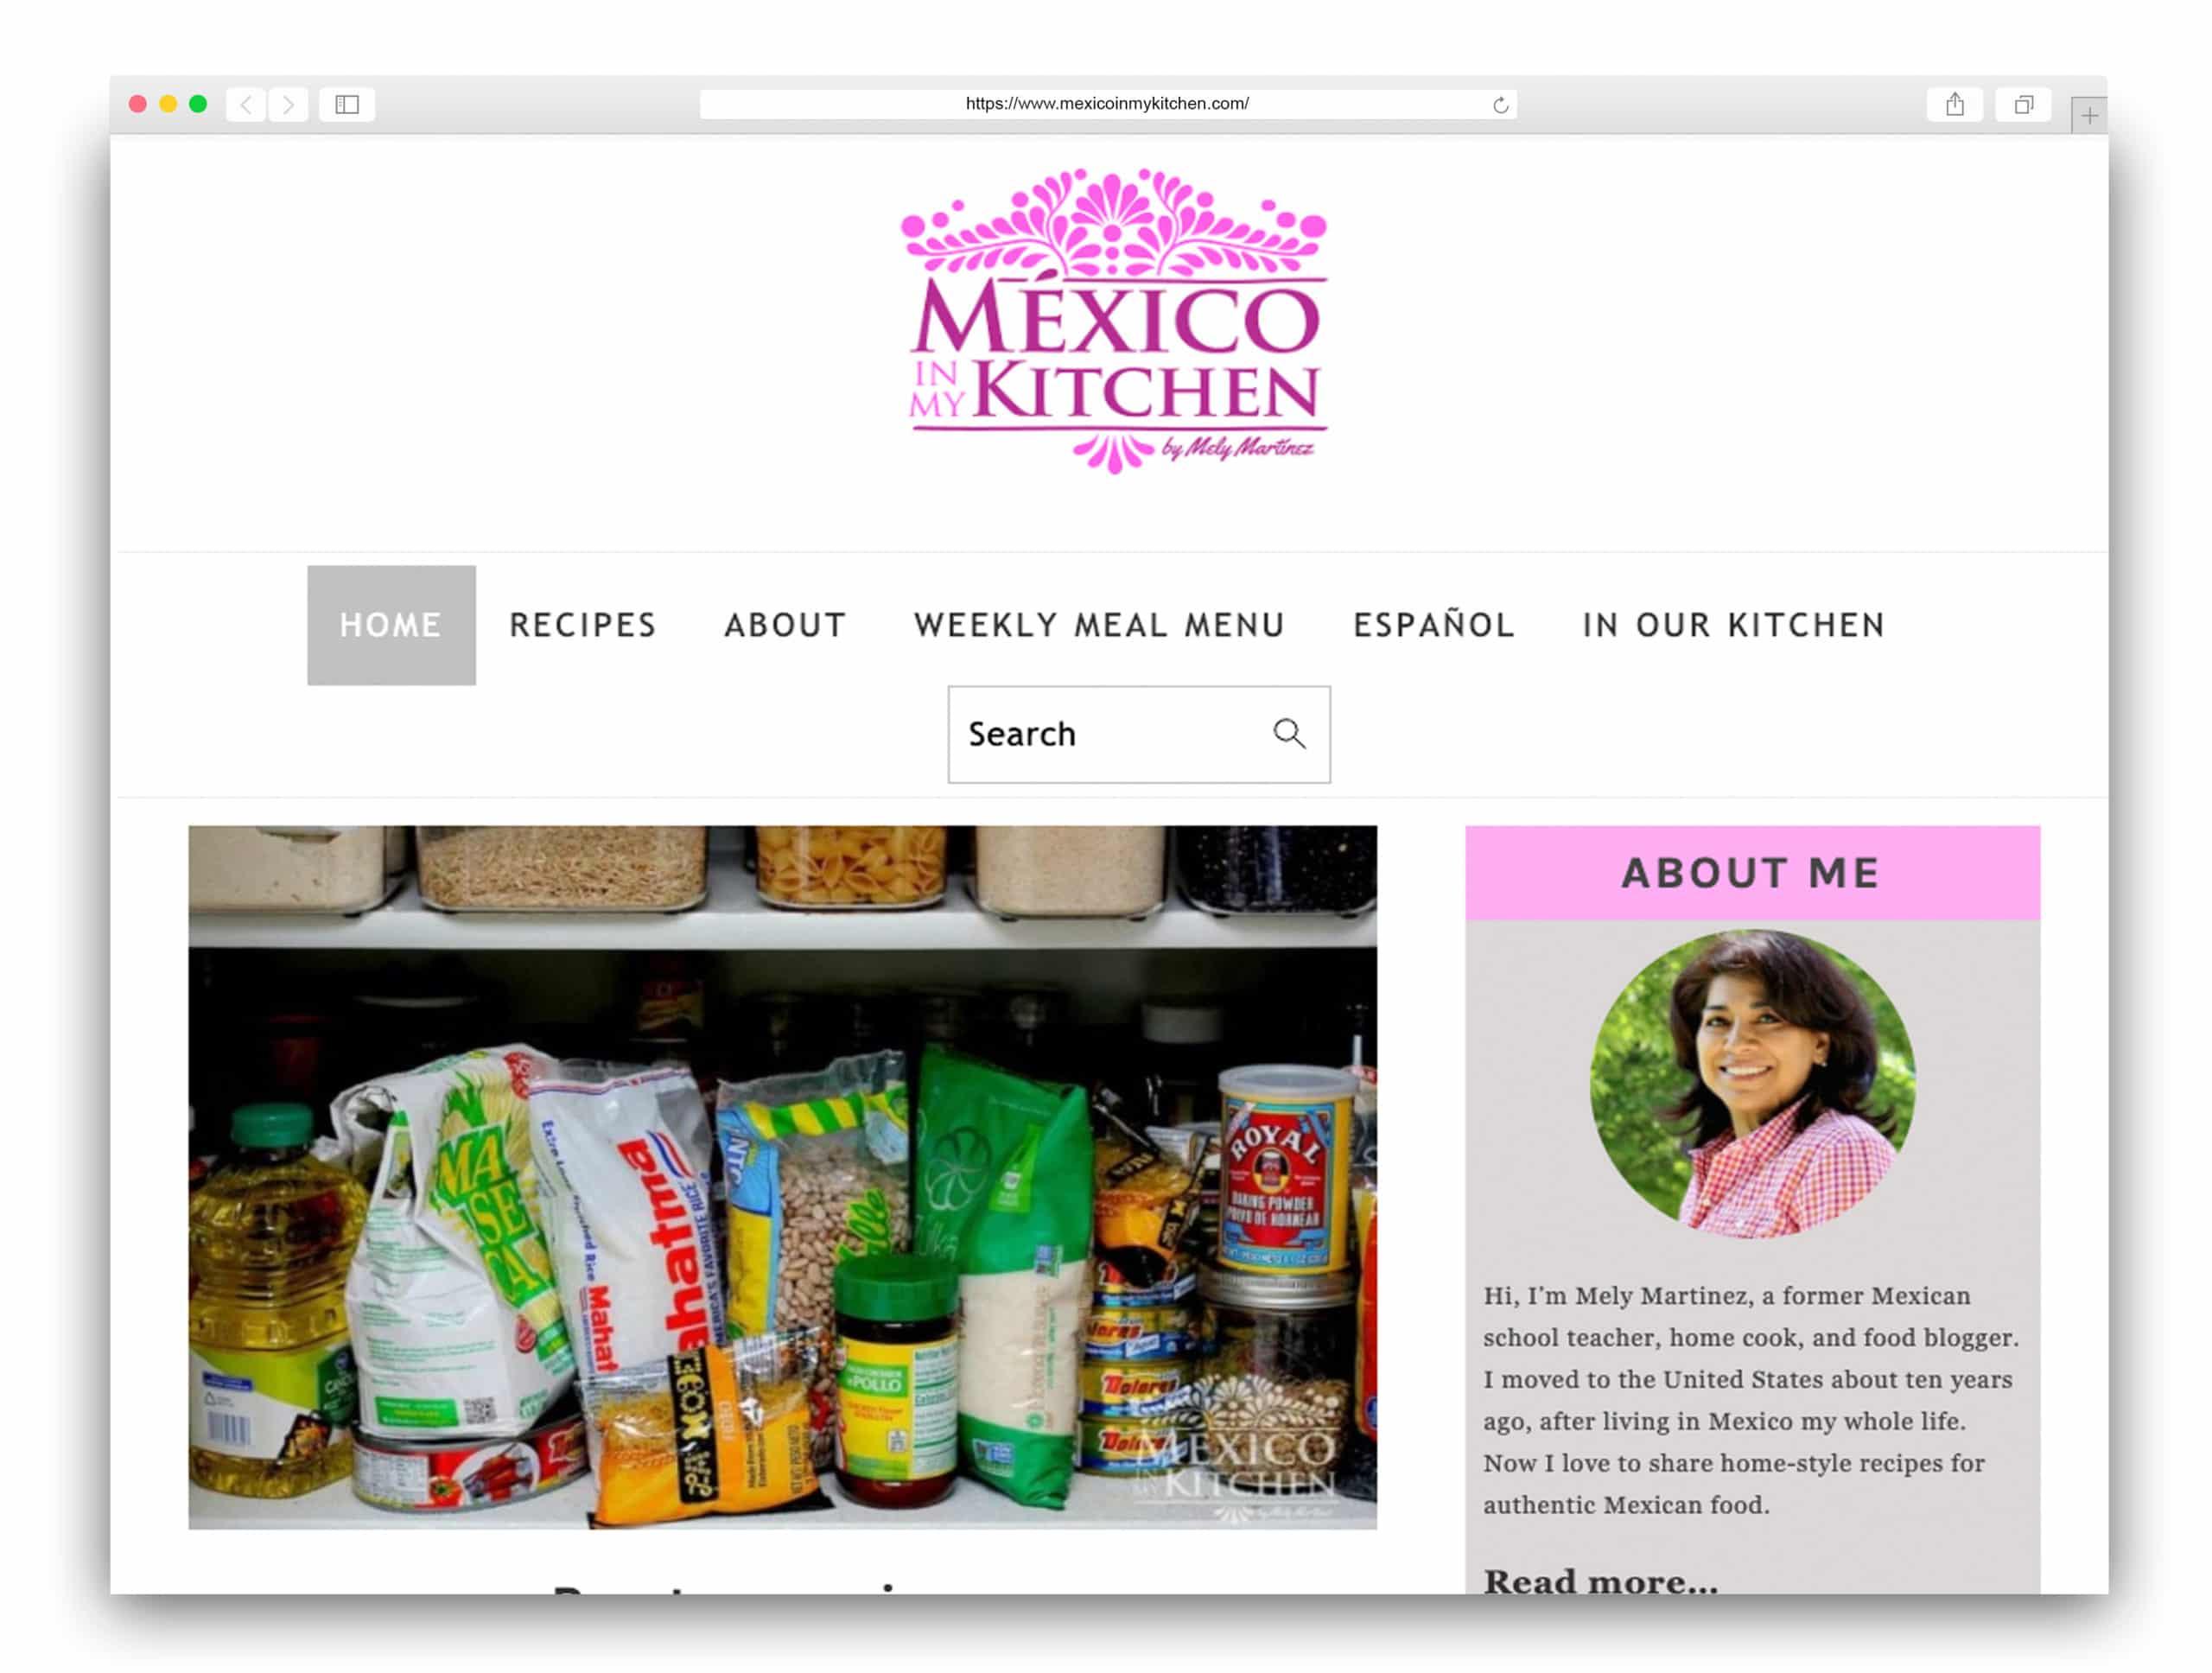 Mexicoinmykitchen